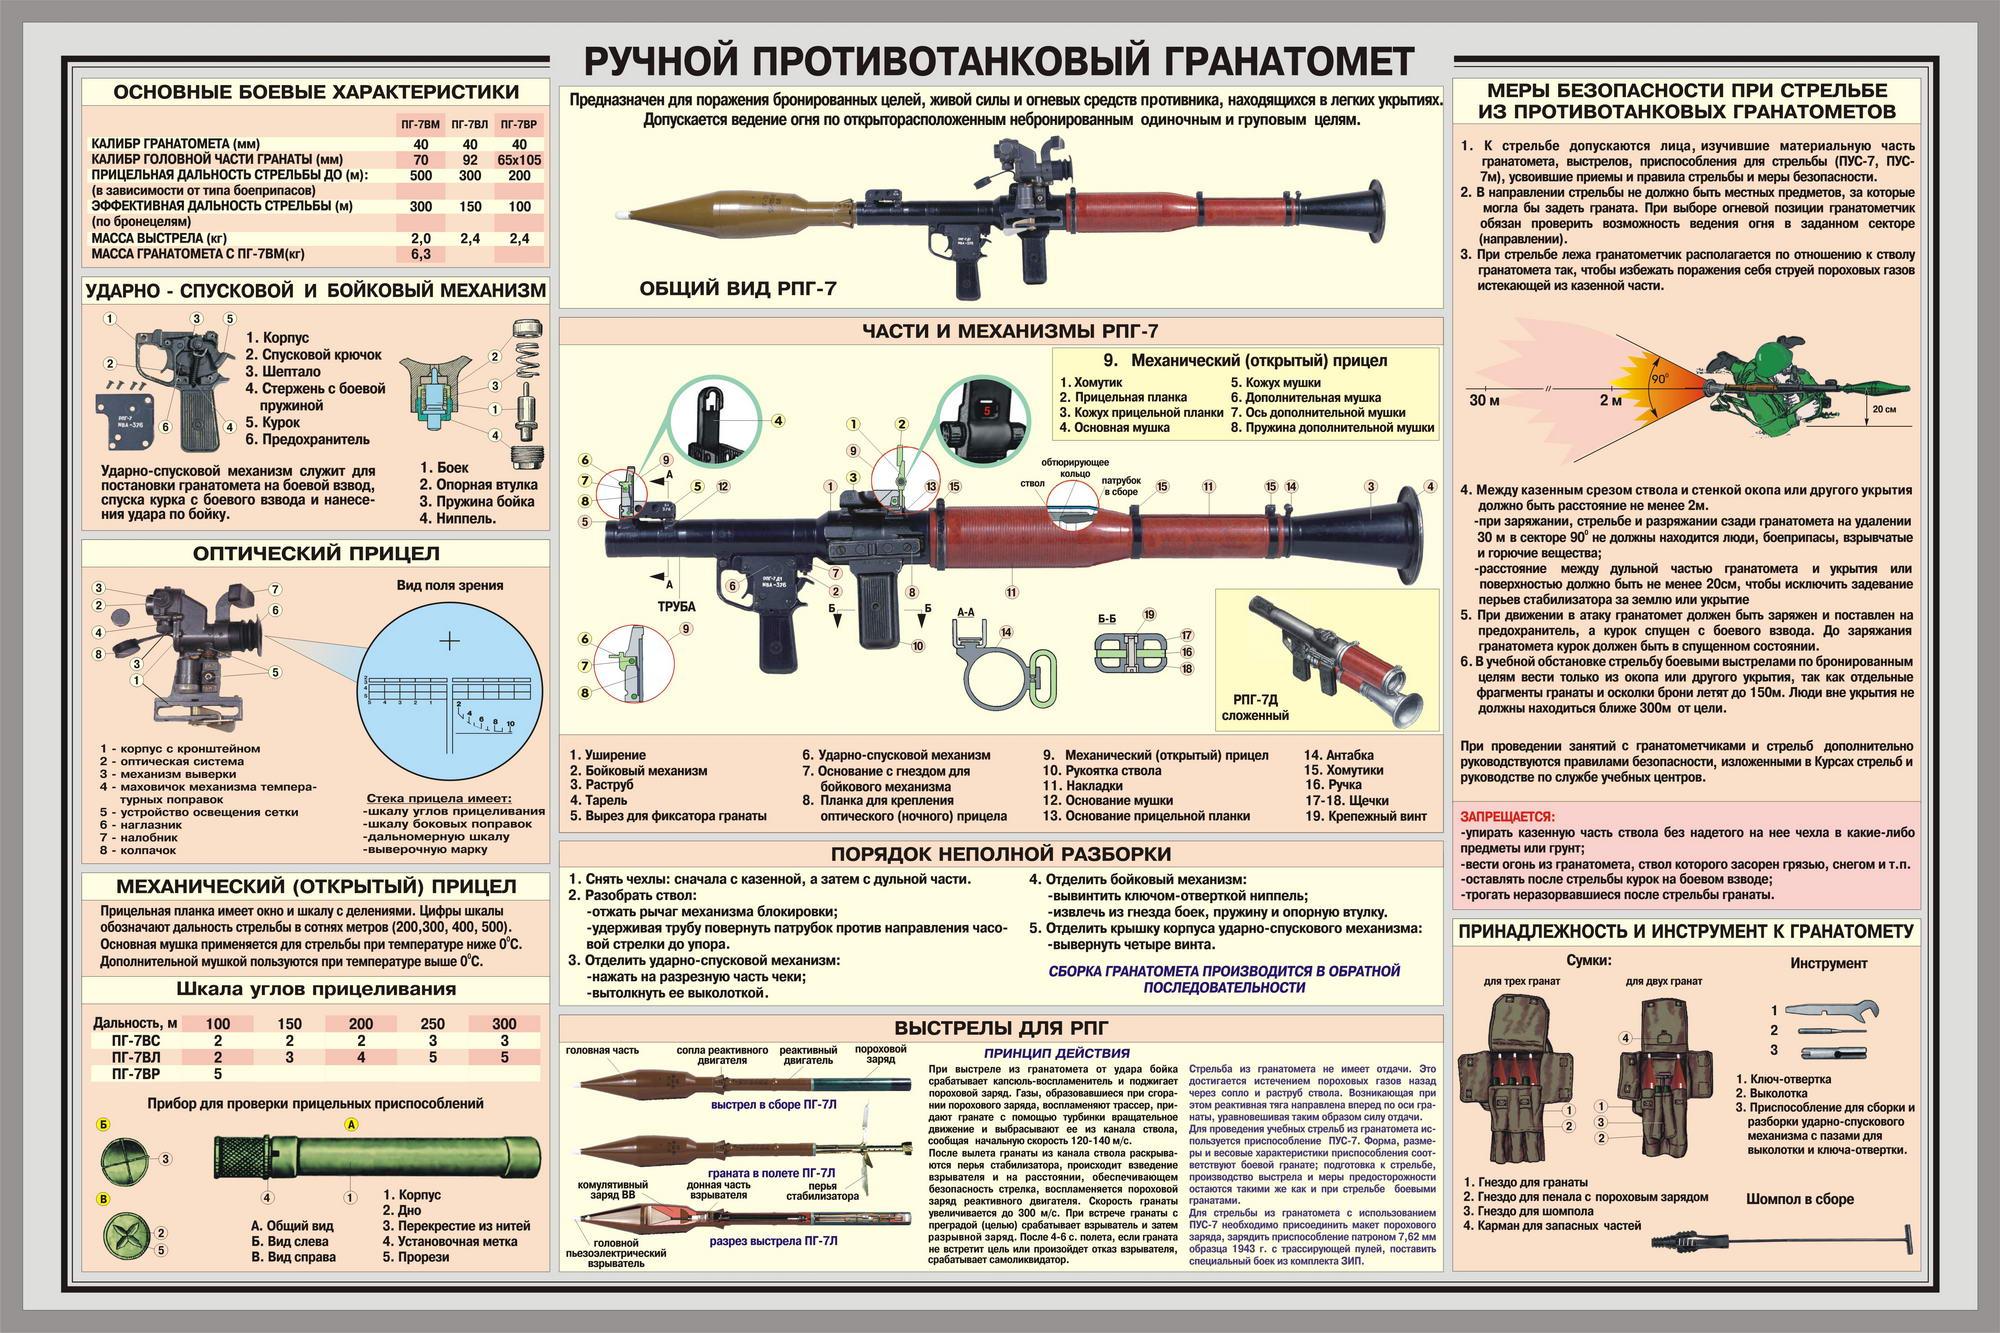 Рачни ПО ракетни фрлачи (RPG, Zolja, AT-4...) - Page 4 689193vm0